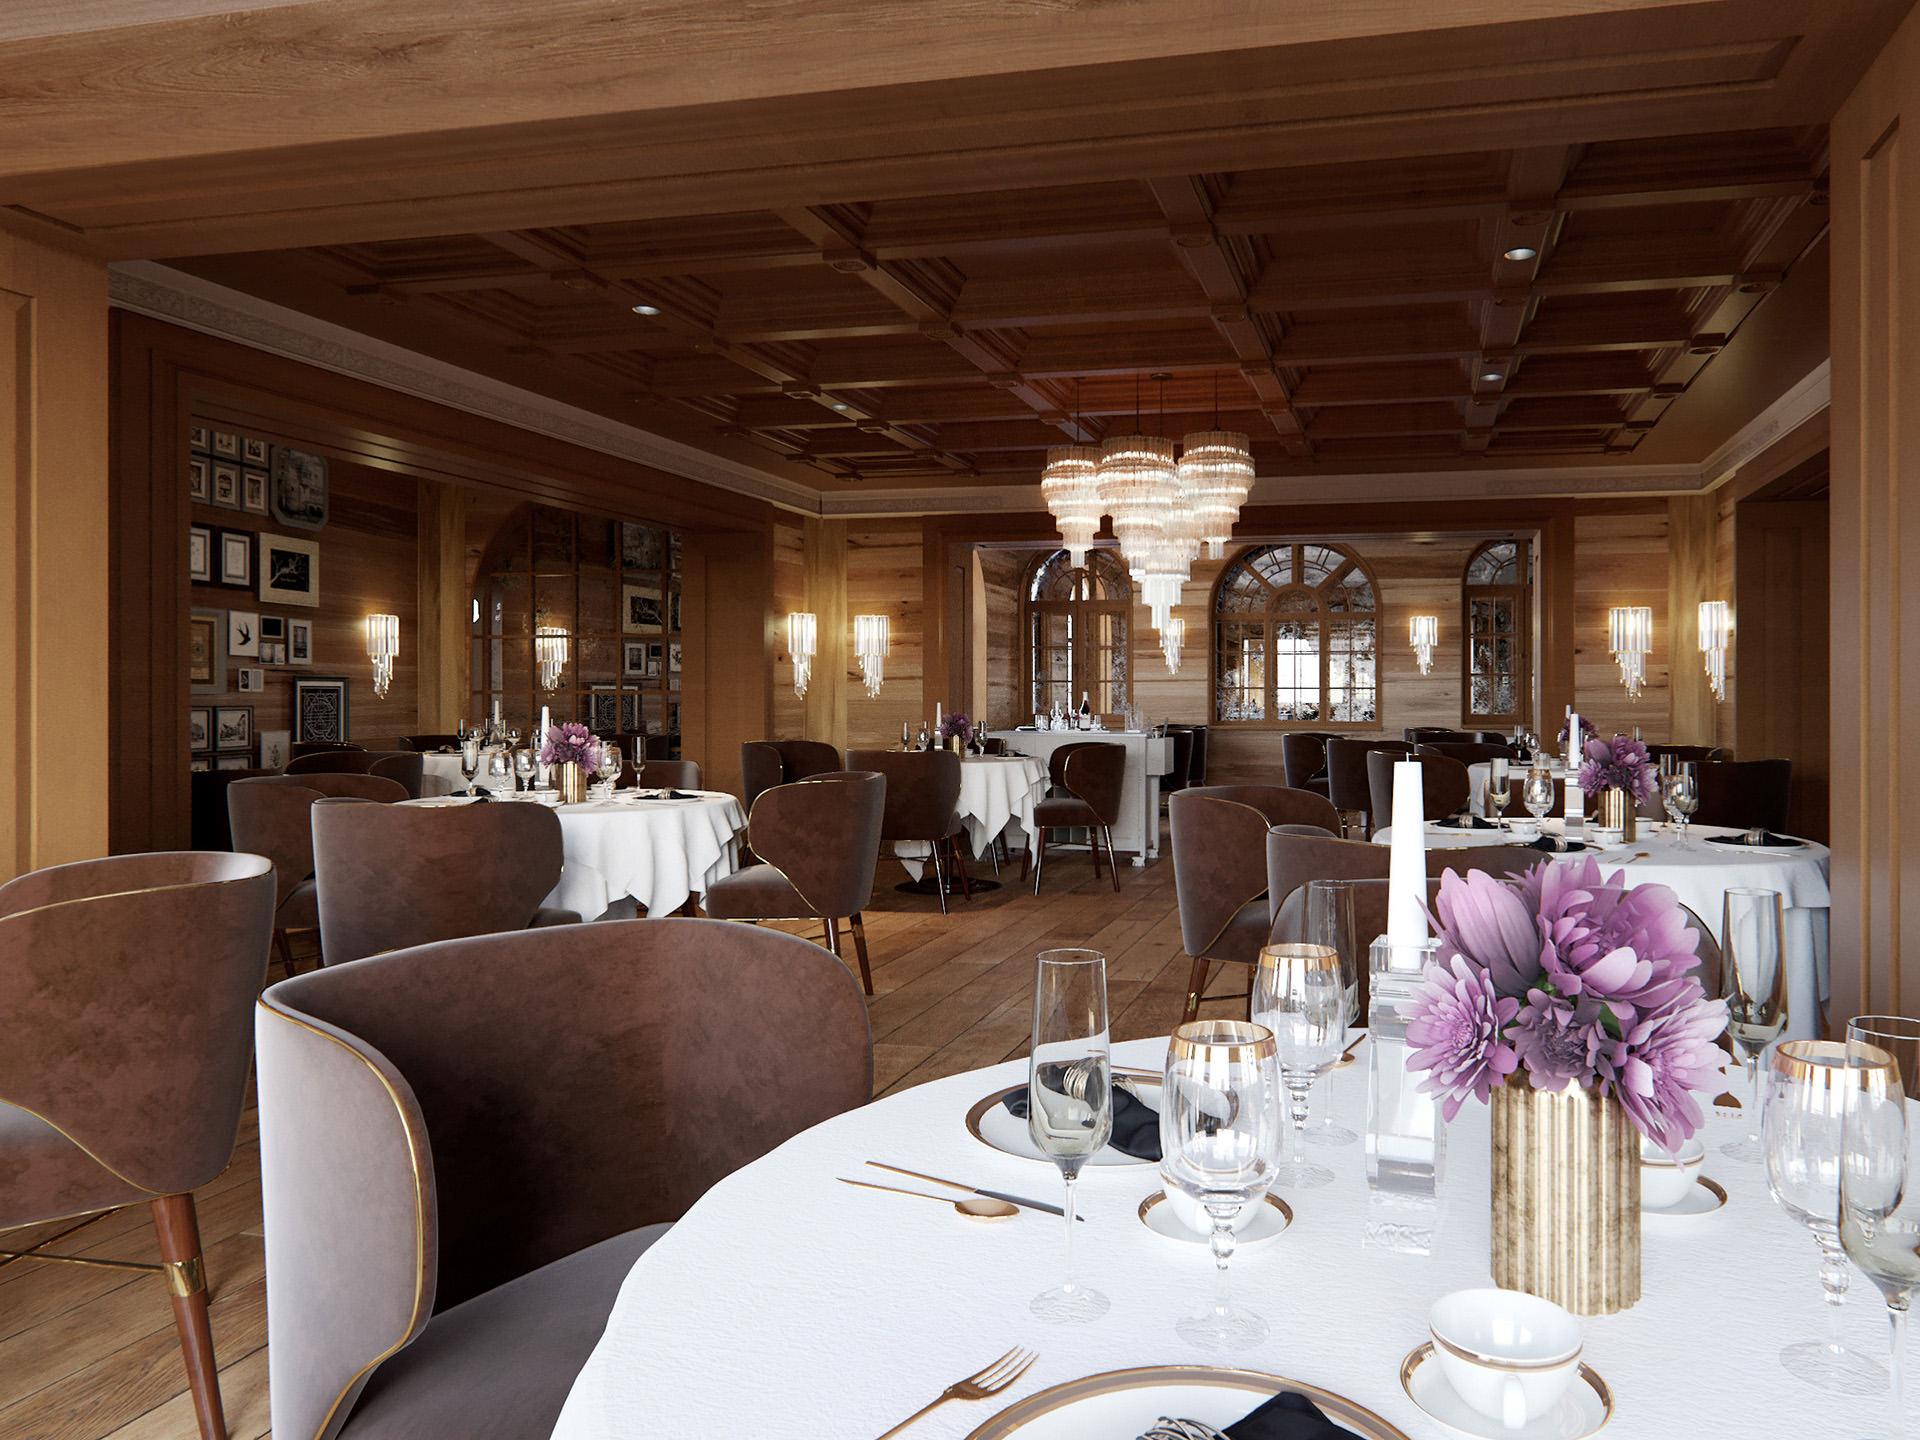 3D-interior-visualization-Mont-Cervin-restaurant